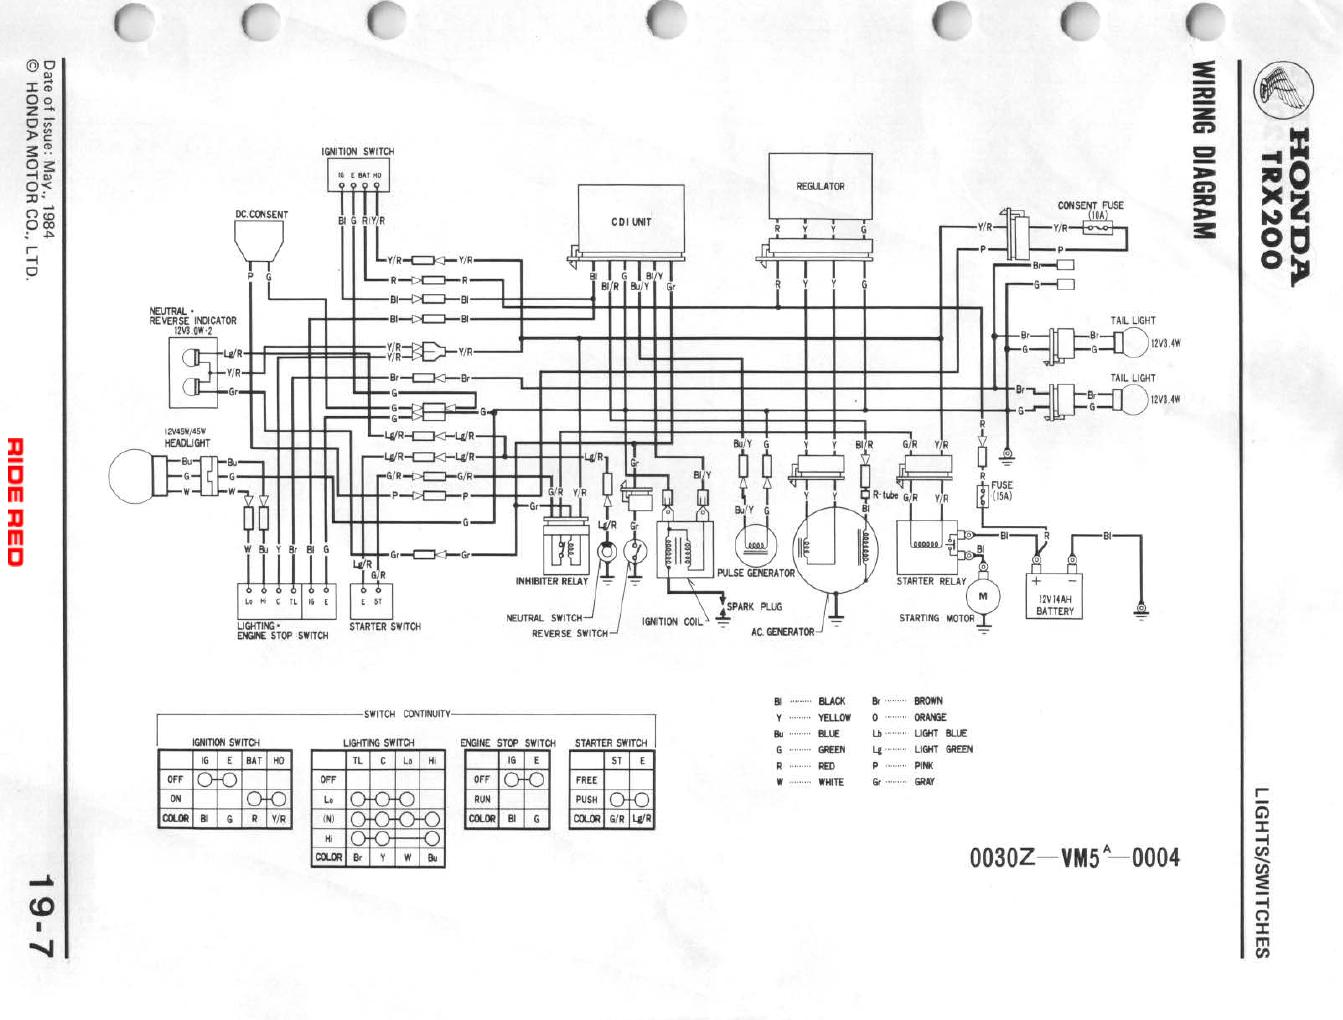 Wiring Diagram For Honda Recon E